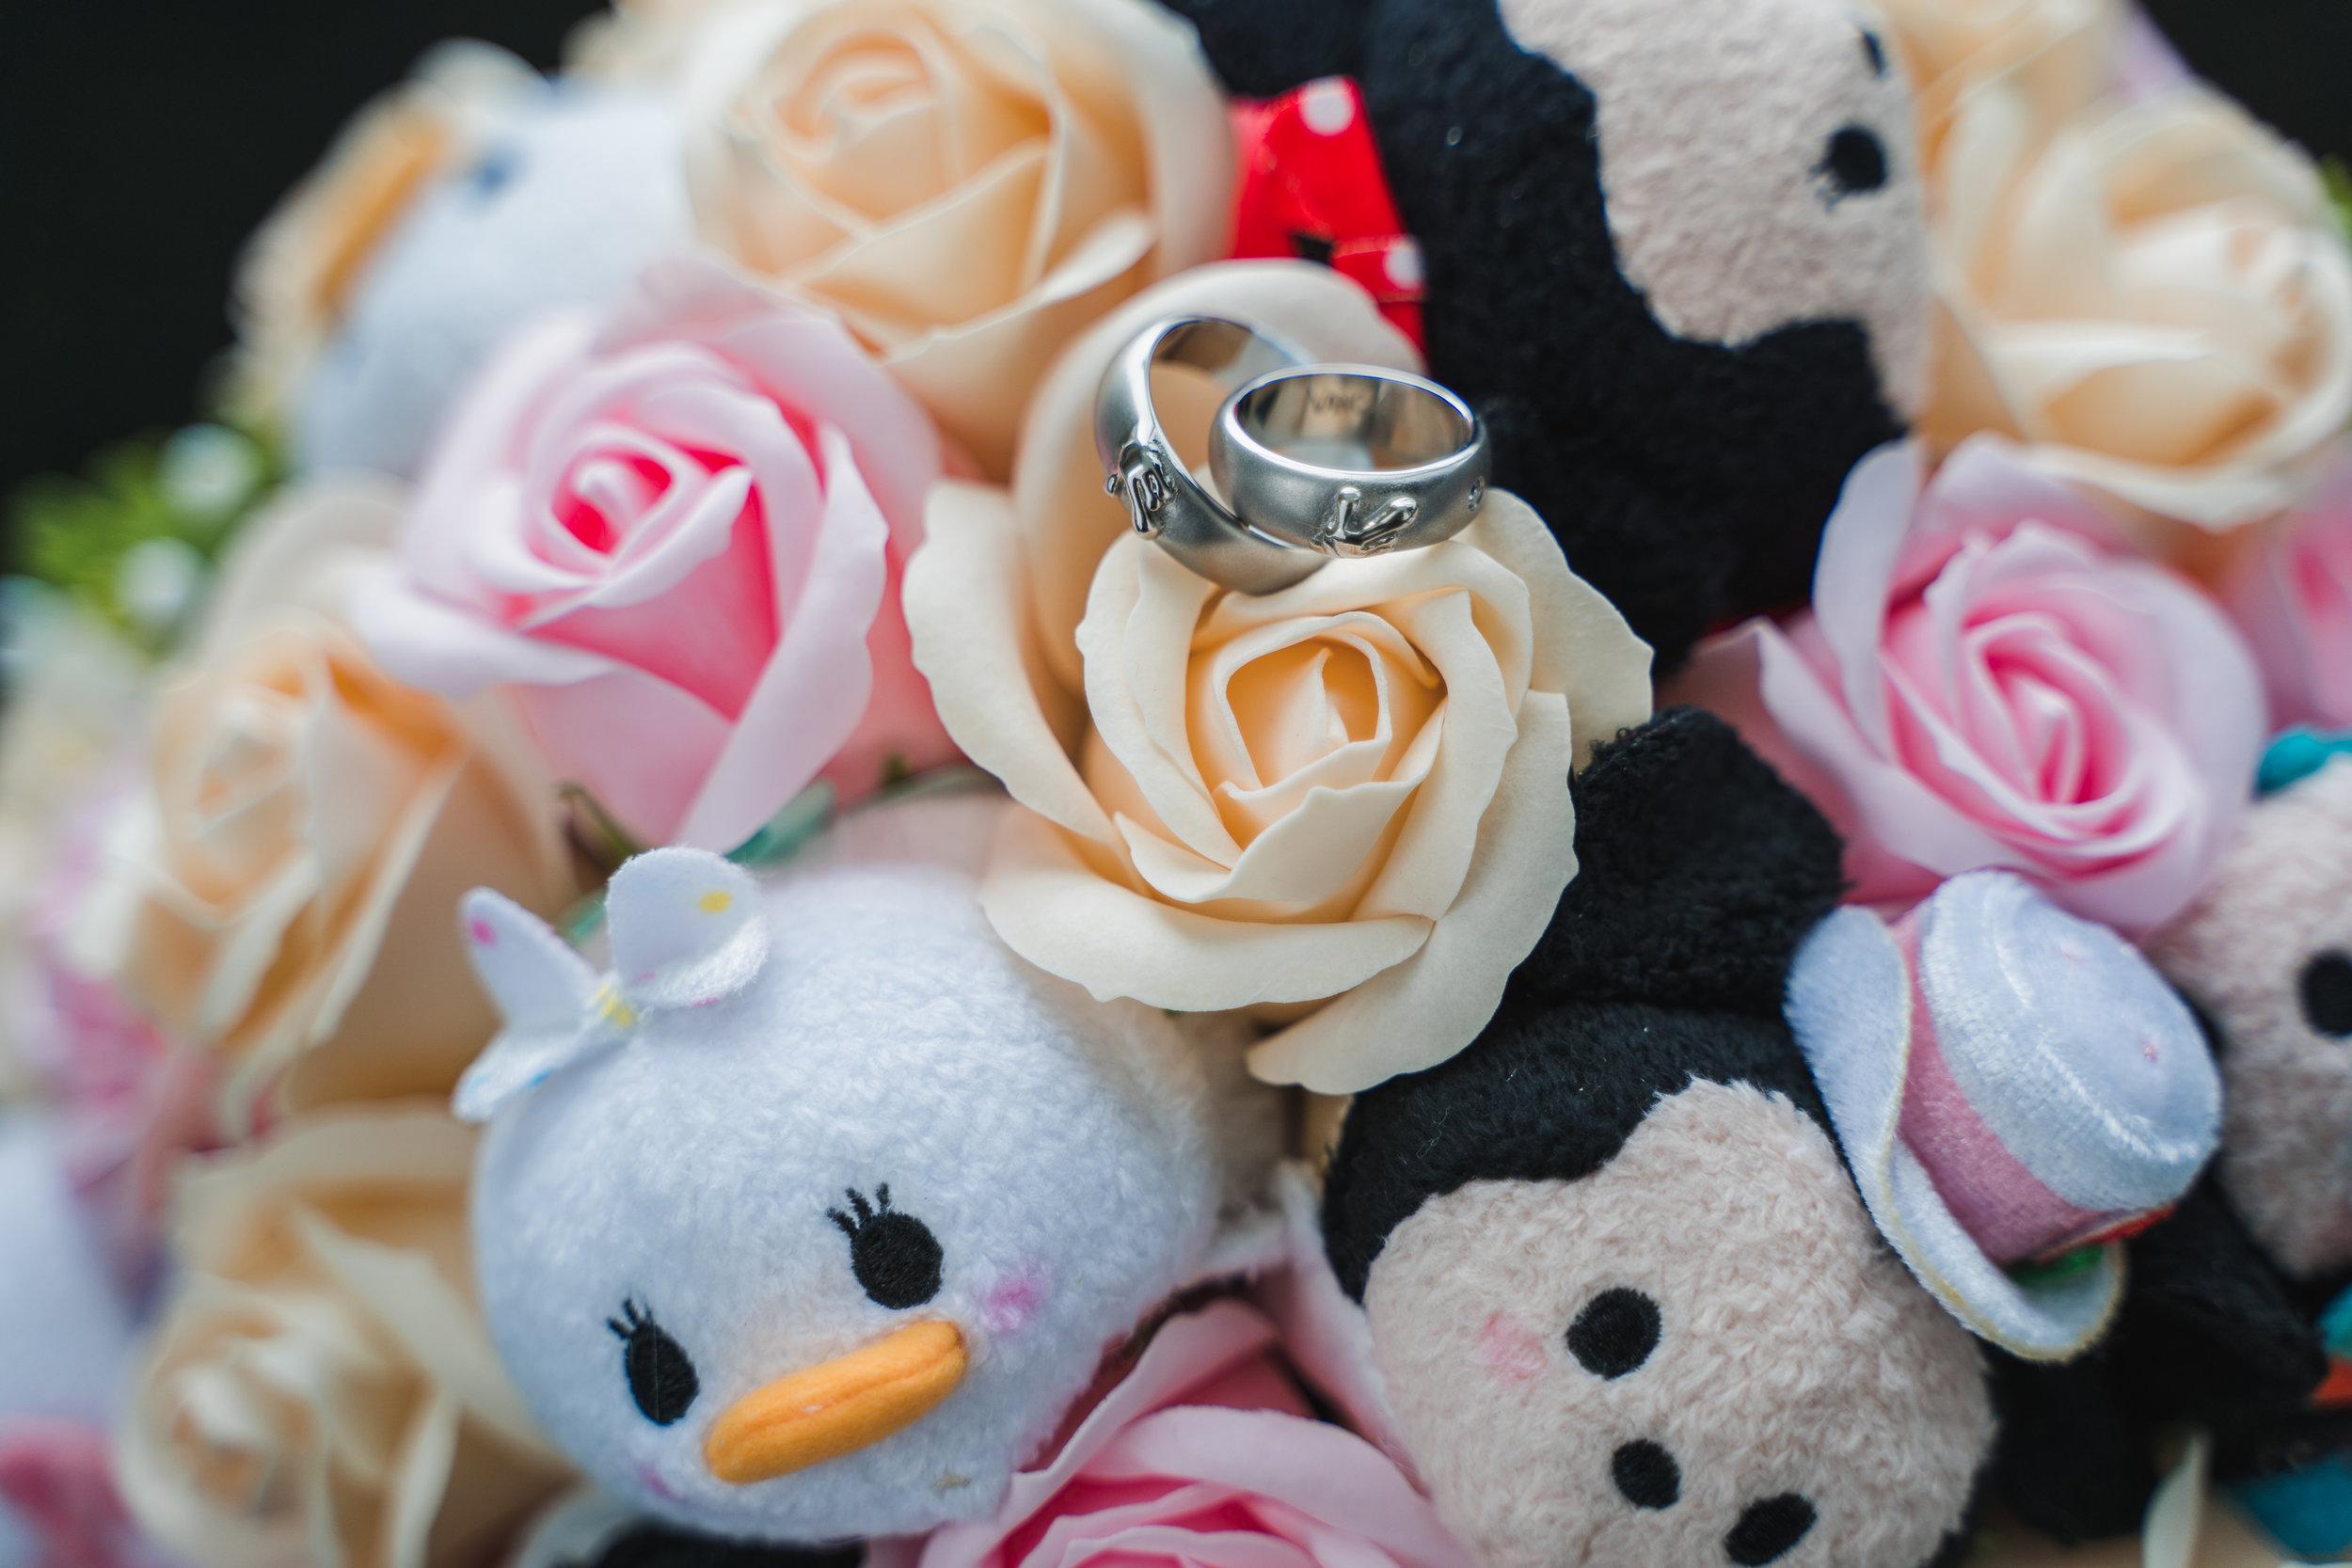 20190520 - Pamela & Matthew Wedding - 0033.jpg